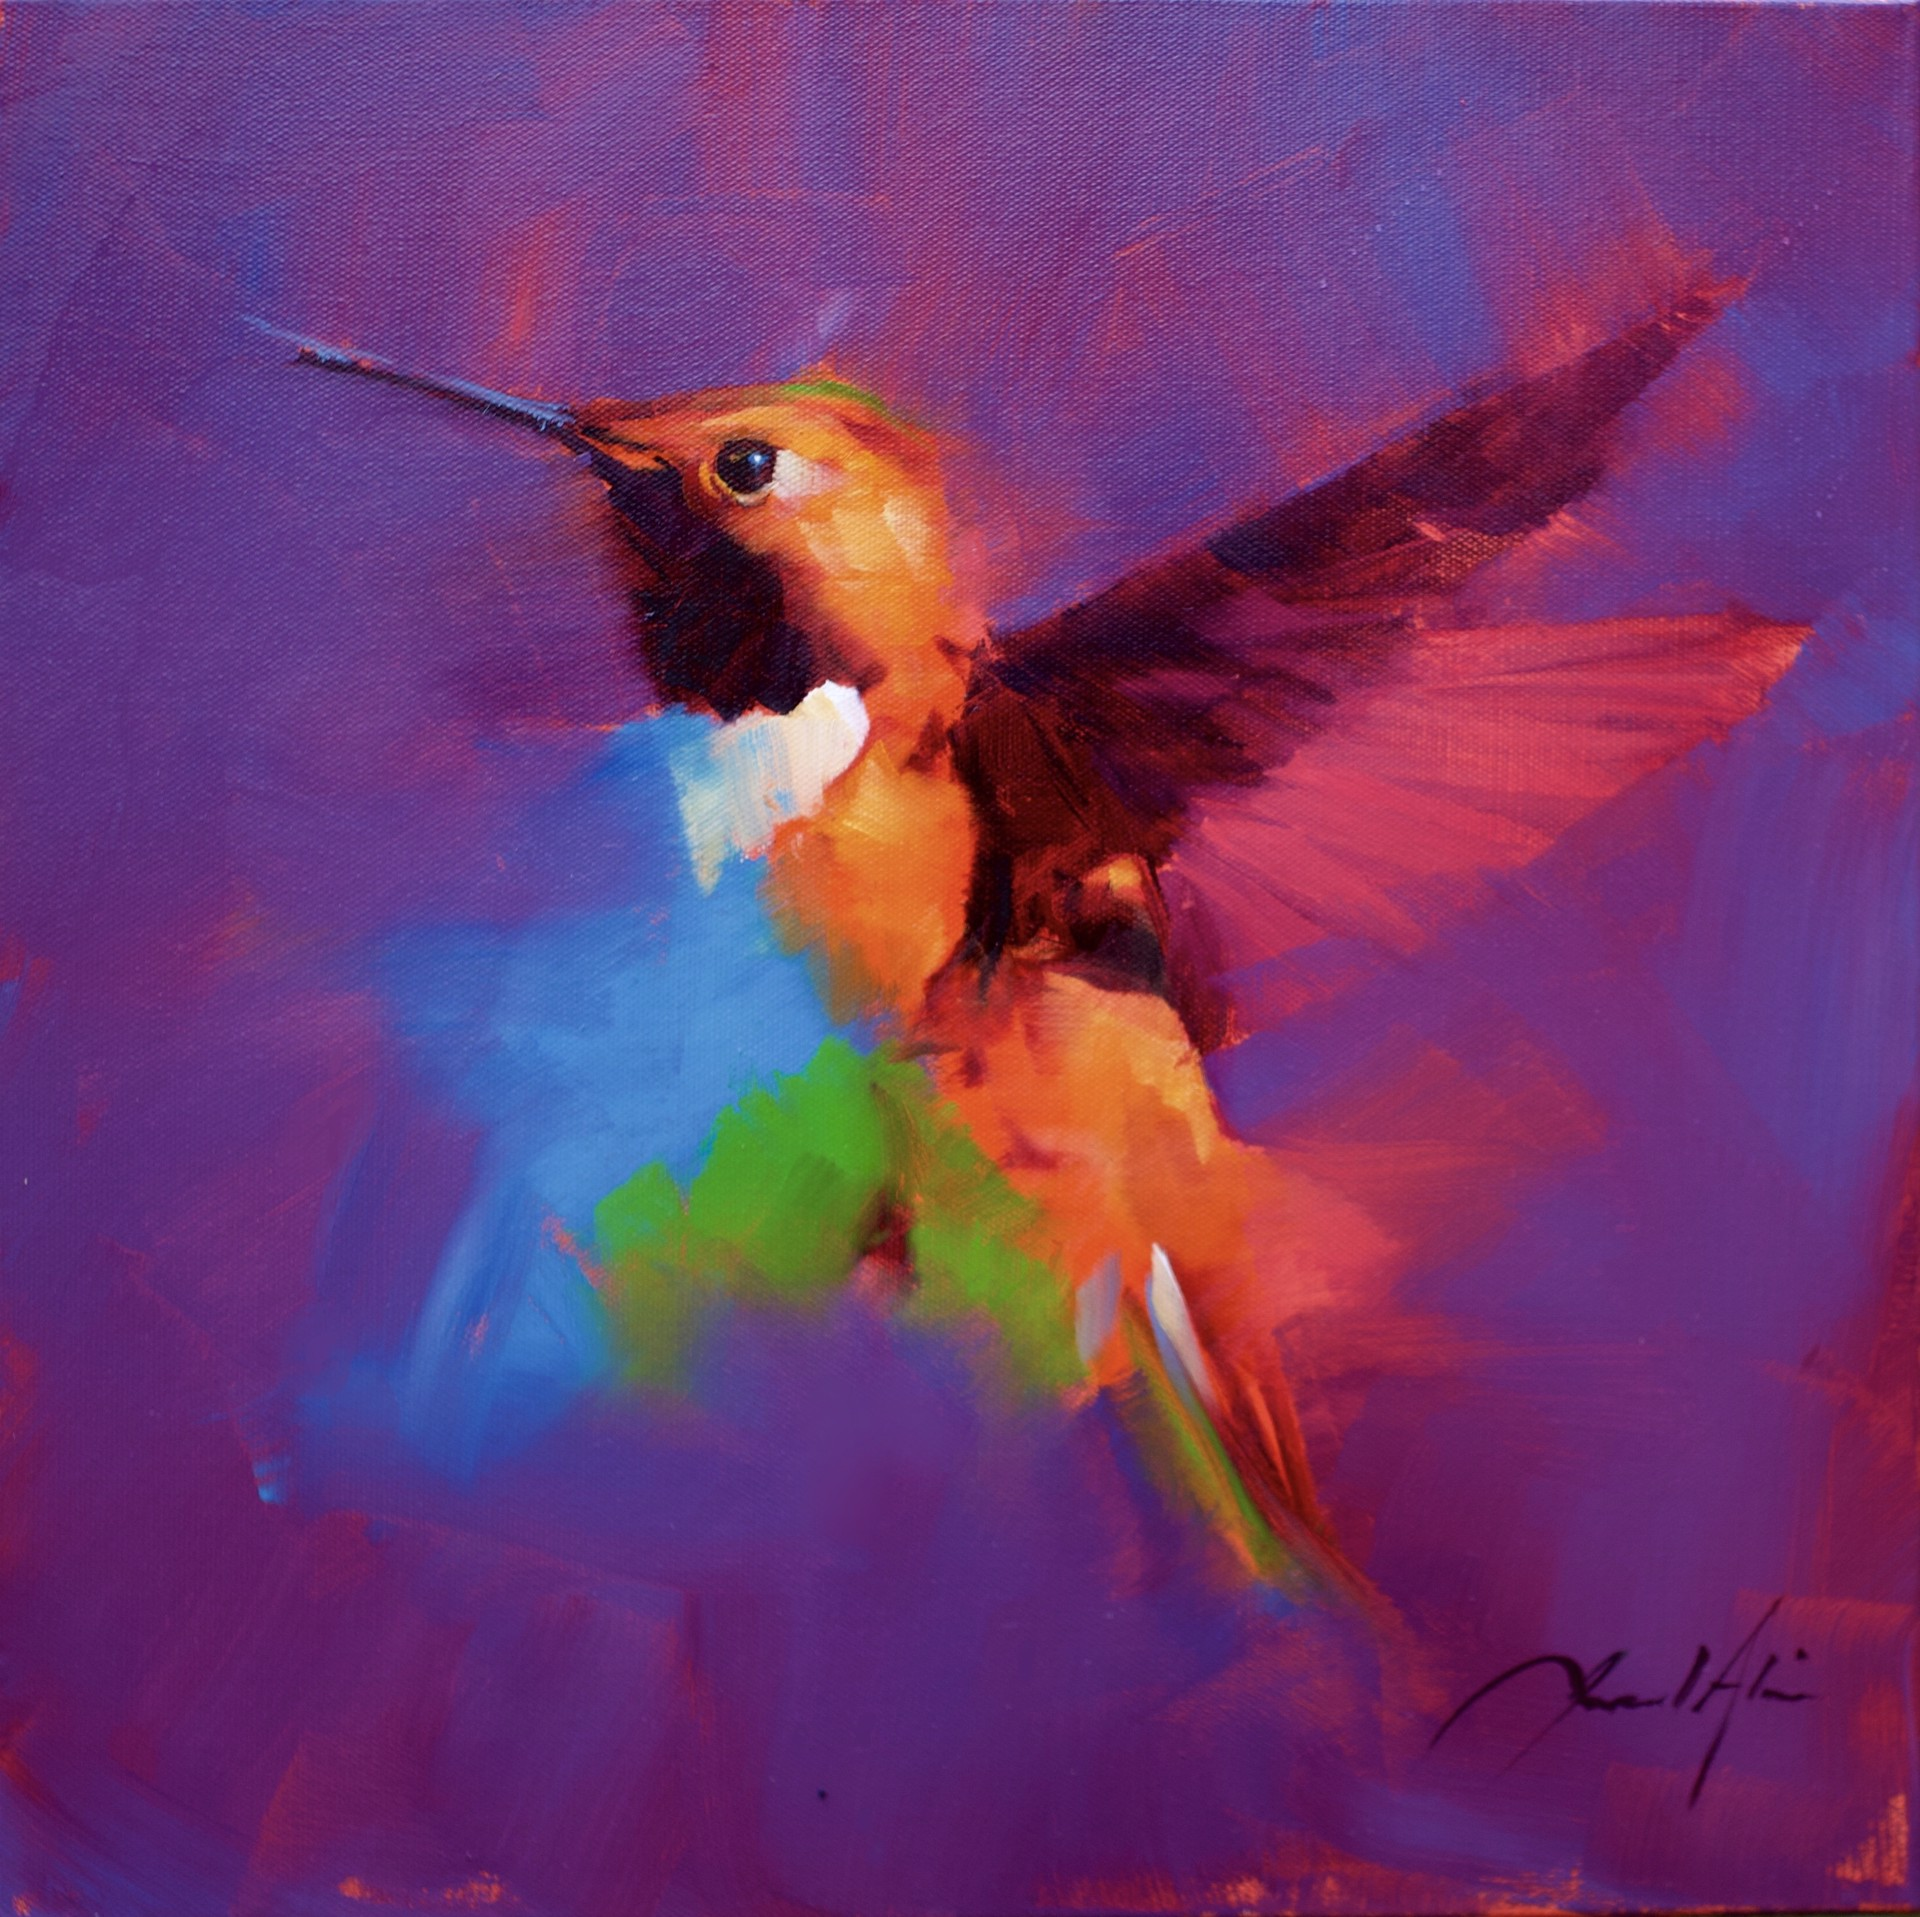 Hummingbird XIII by Jamel Akib